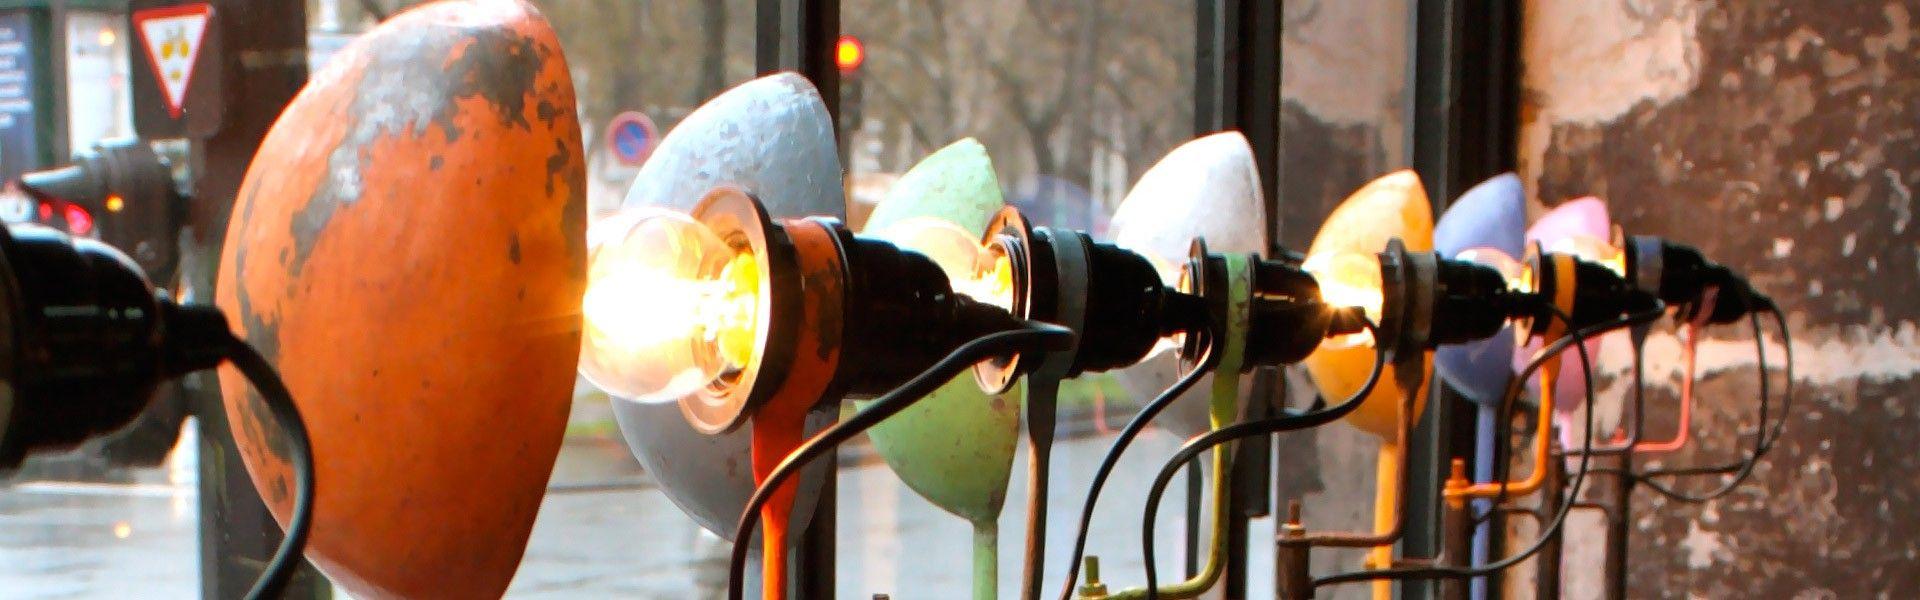 Lampes Cuillères chez LNB.